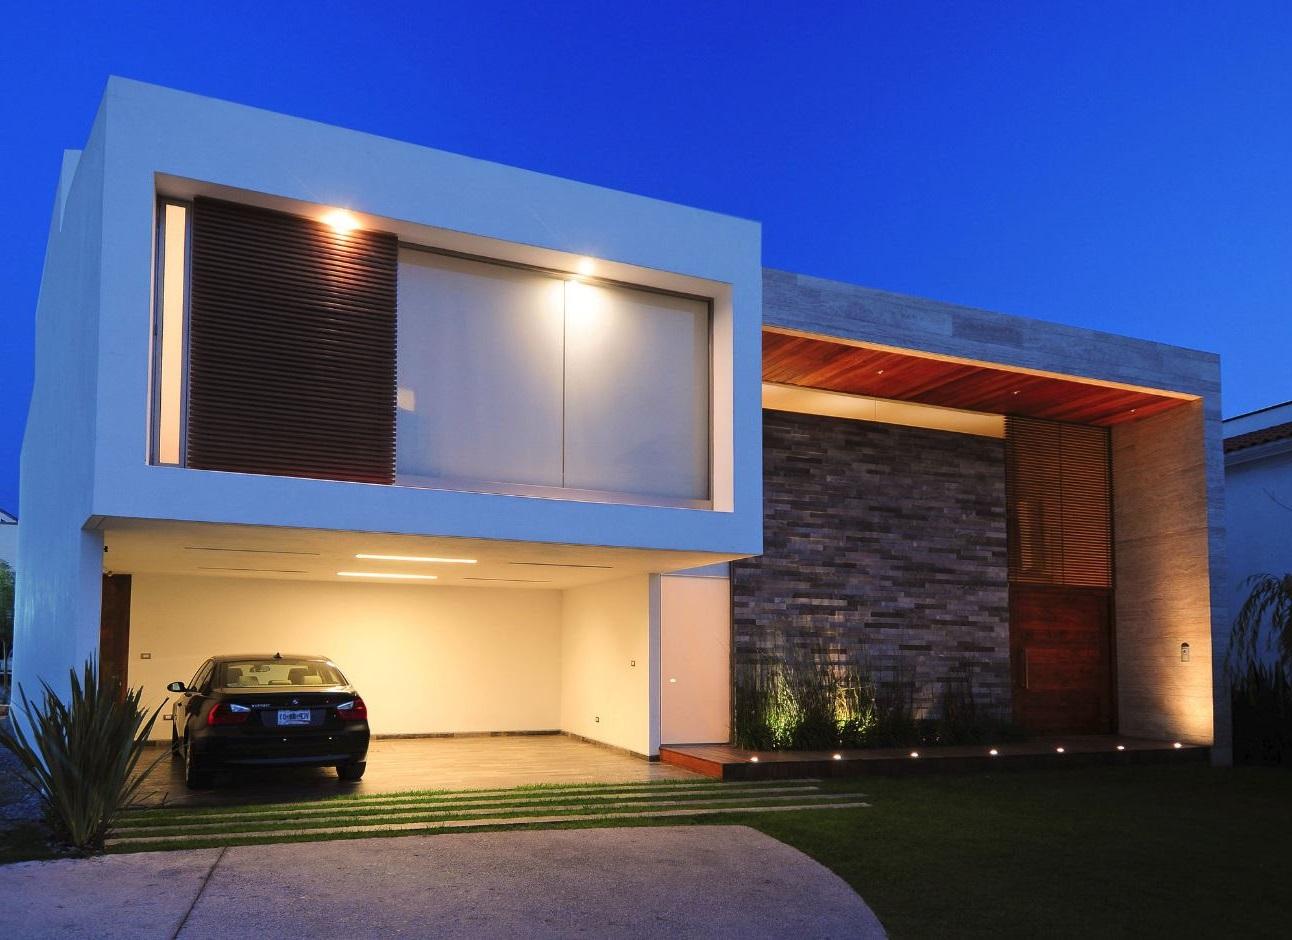 Planos de casas modernas planos de casas gratis y modernas for Casas modernas de una planta minimalistas